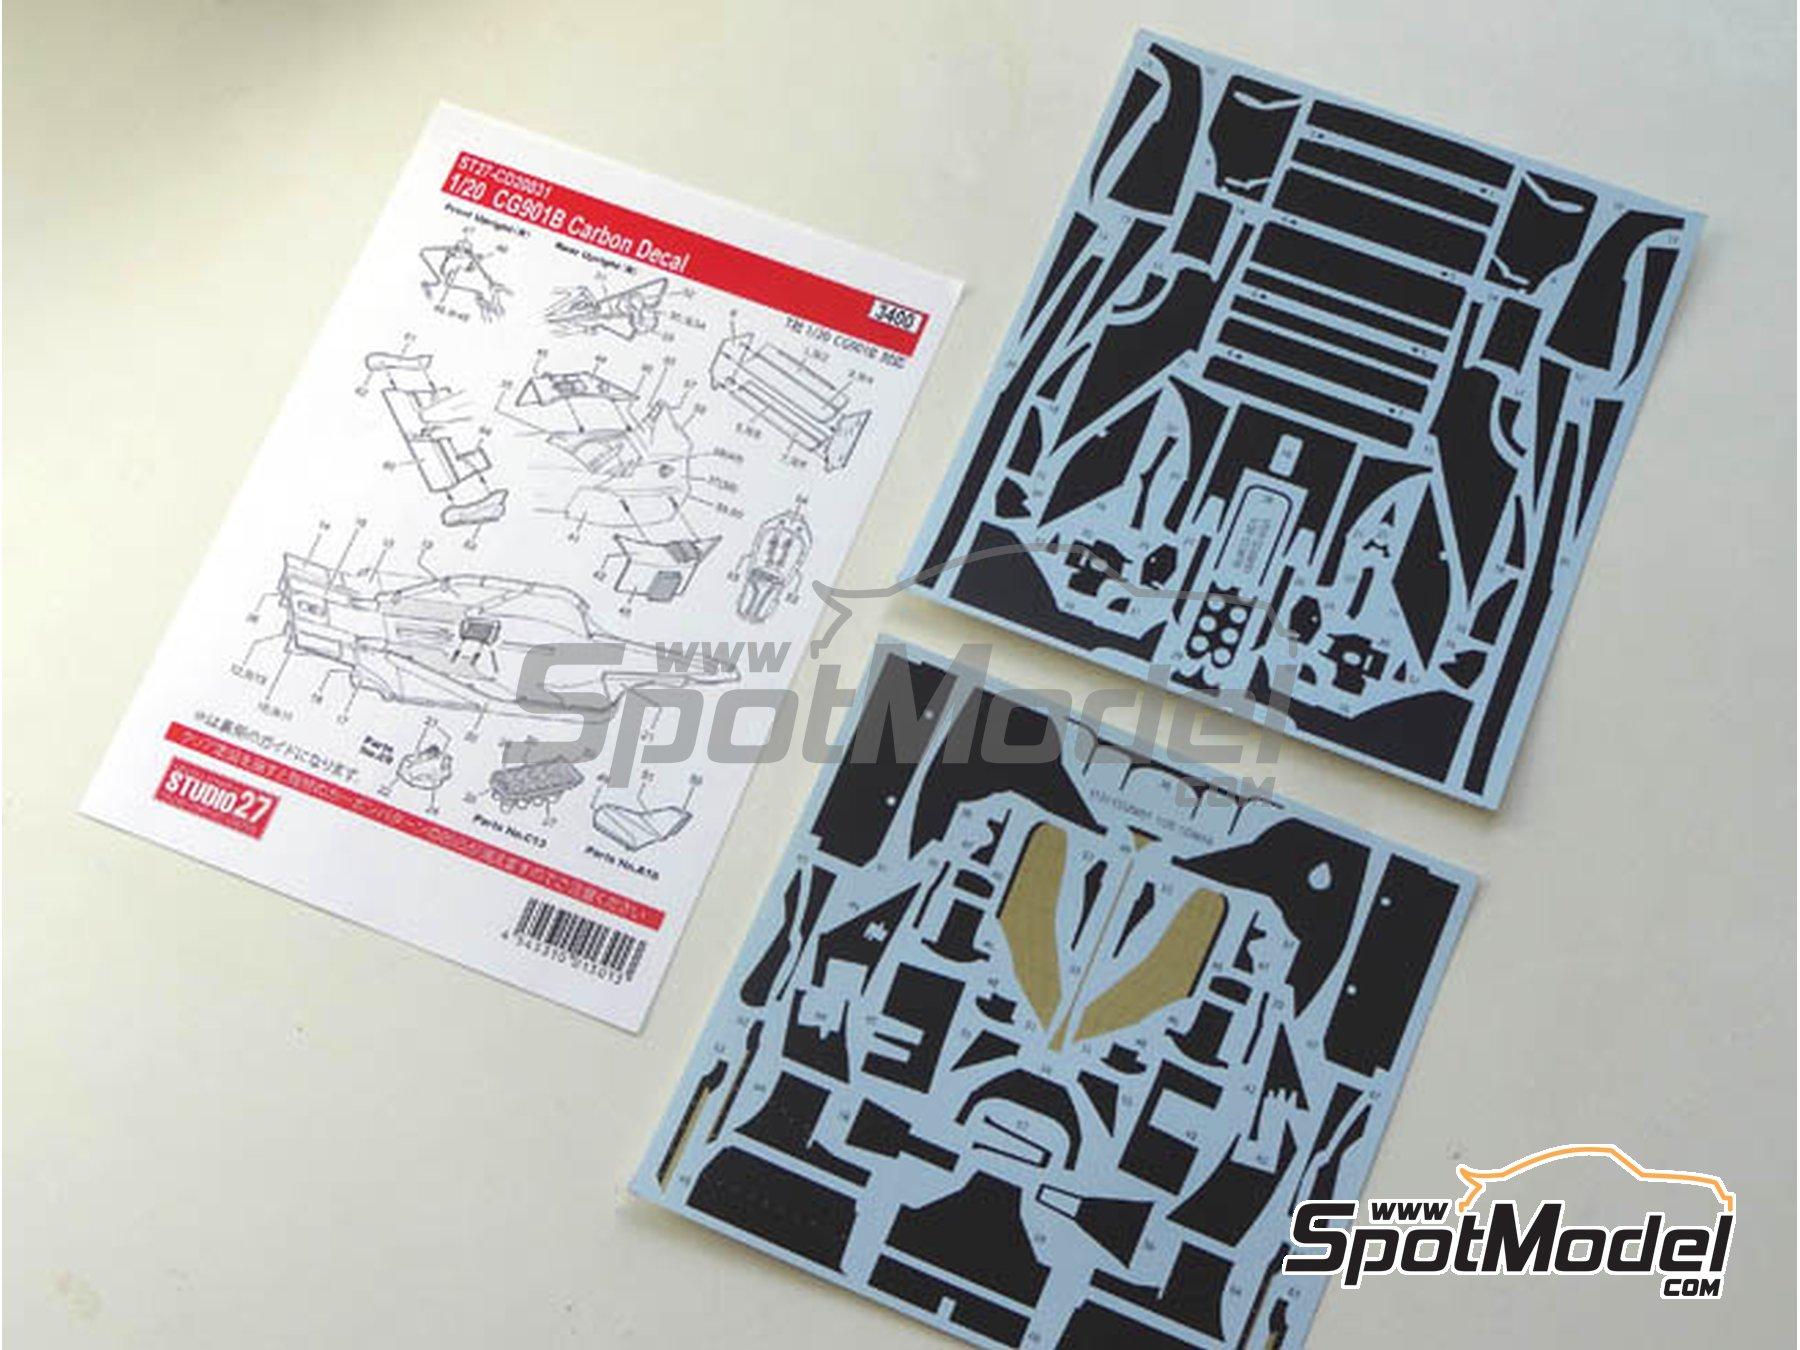 Image 1: Leyton House Judd CG901B Carglass - Campeonato del Mundo de Formula1 1990 | Patron de fibra de carbono en calca en escala1/20 fabricado por Studio27 (ref.ST27-CD20031)